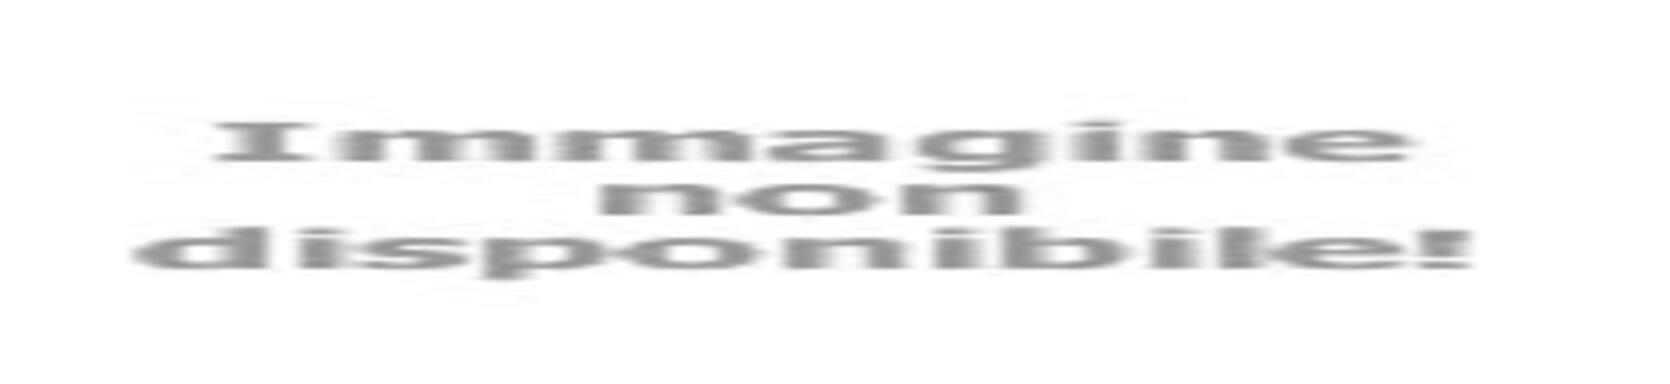 basketriminicrabs it 6-2714-video-eybl-u20-i-tappa-crabs-vs-szolnoki 005